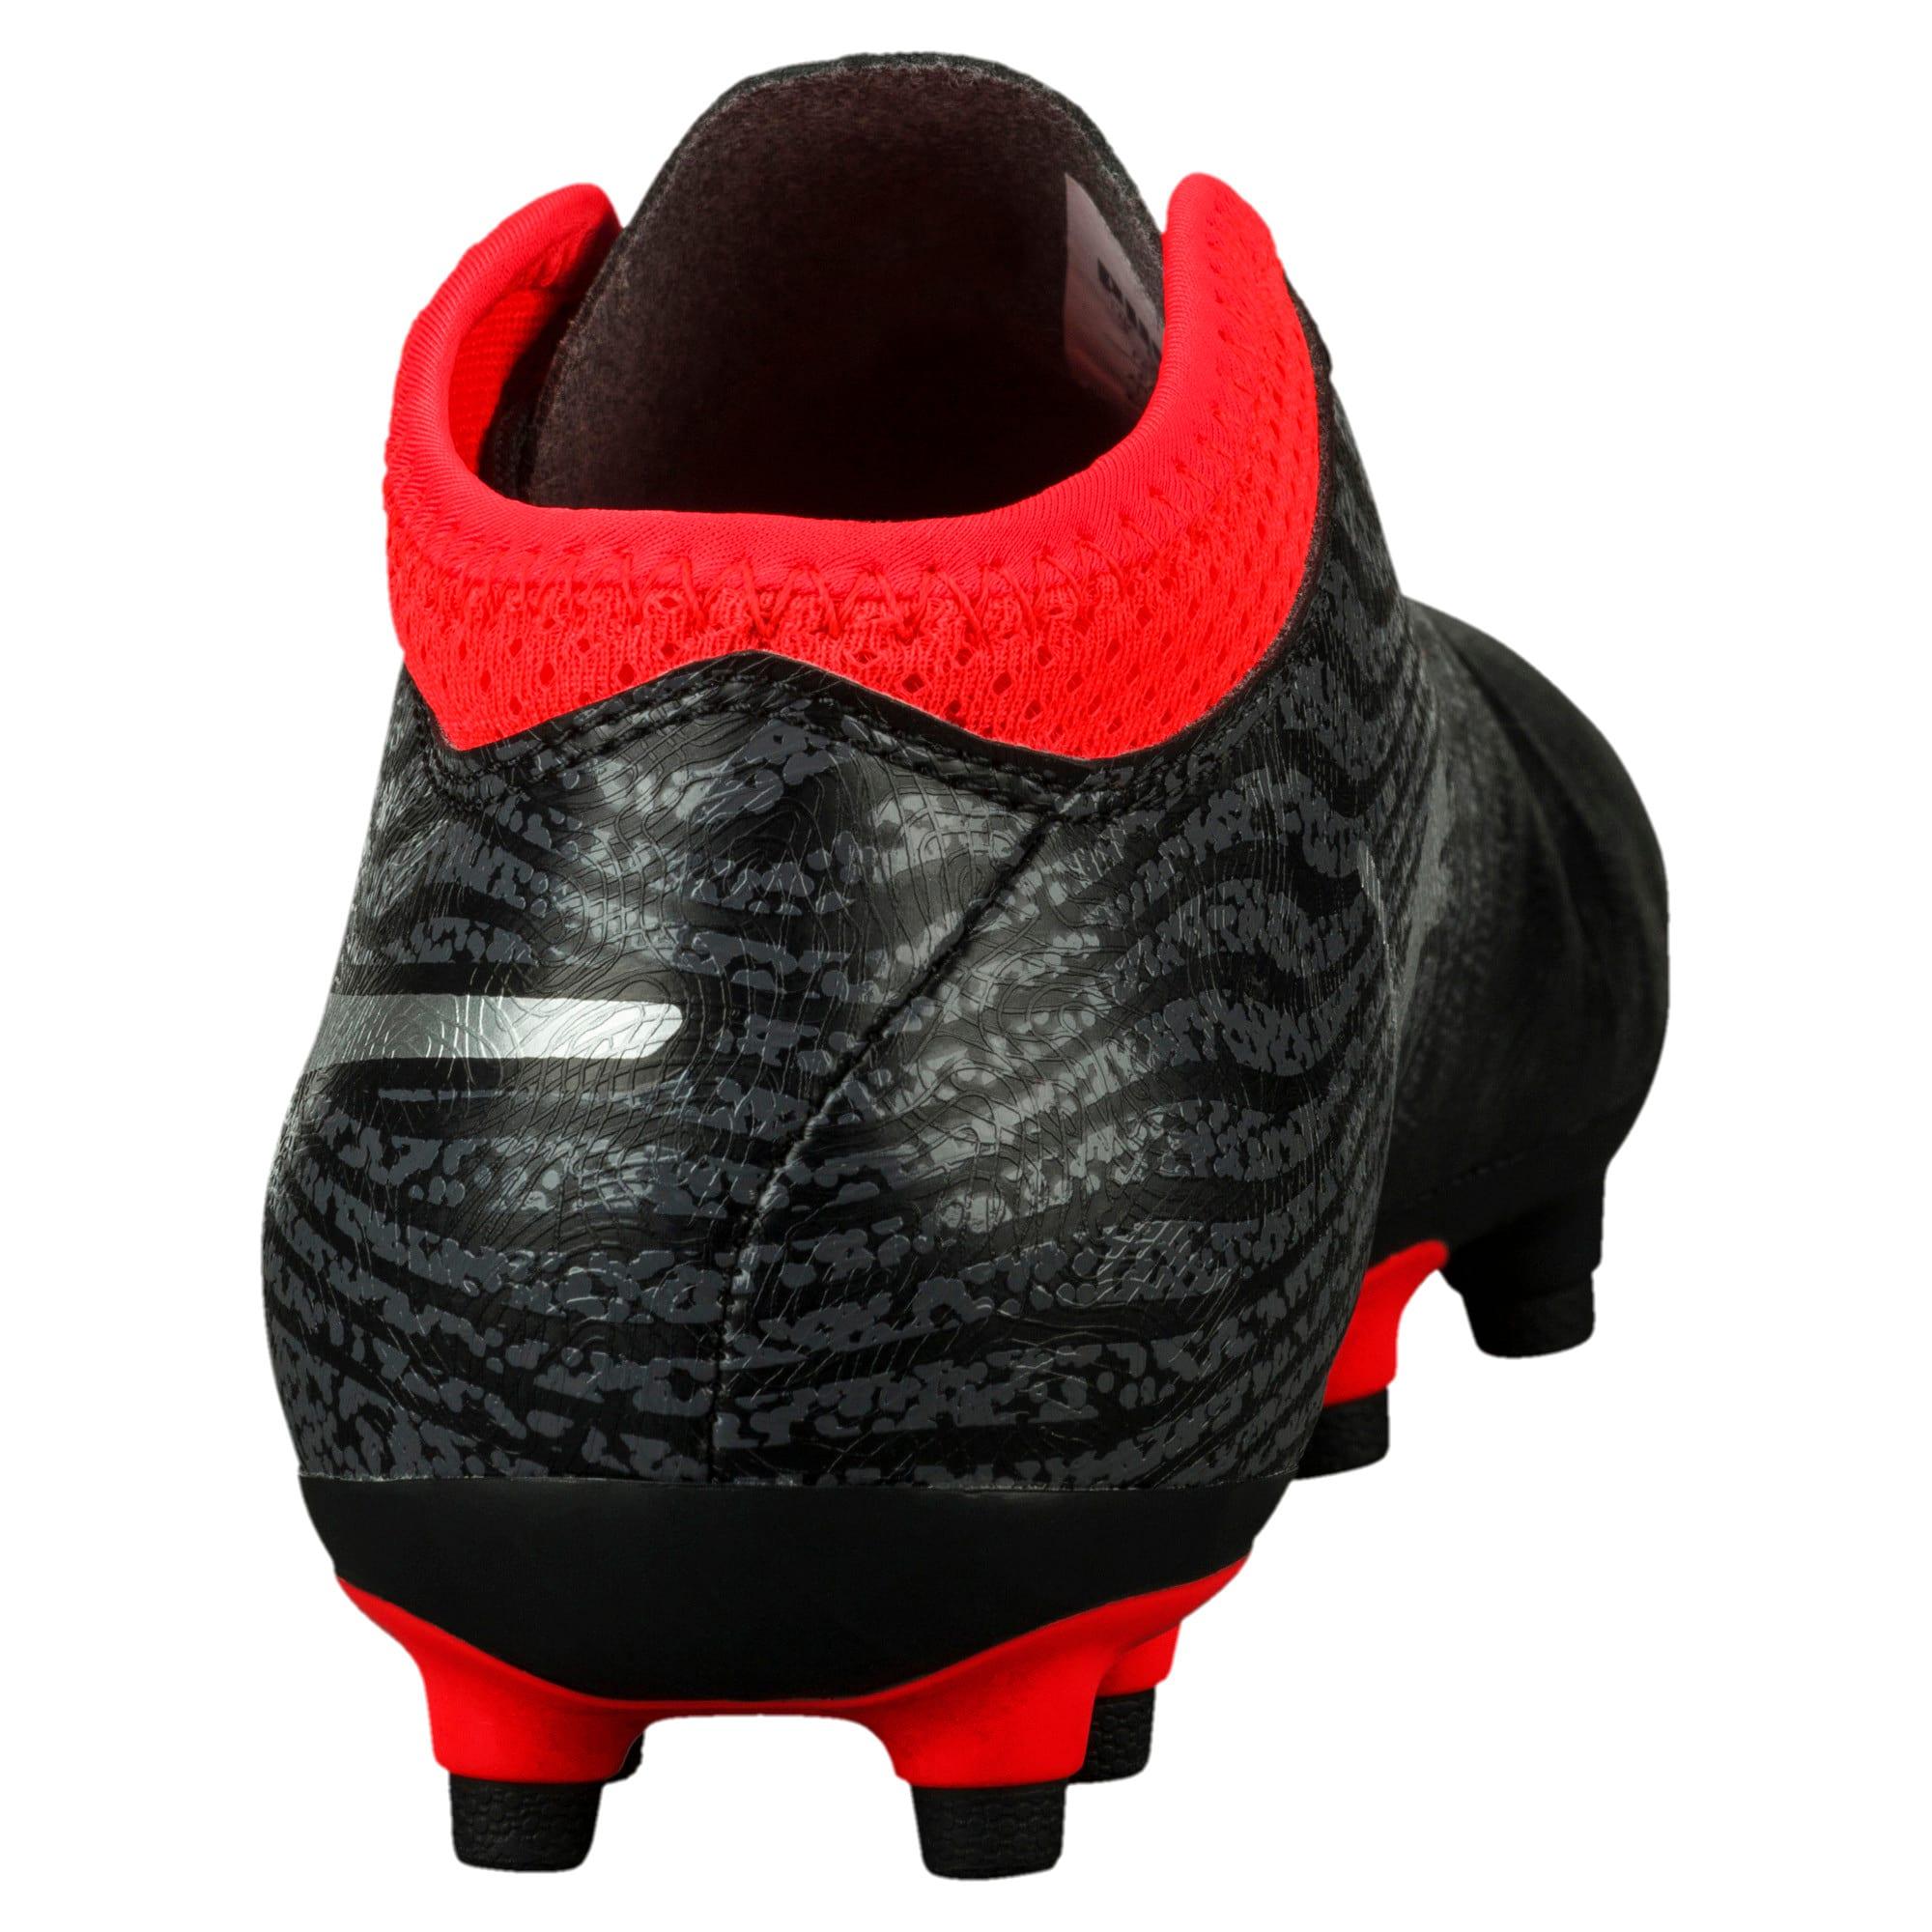 Thumbnail 4 of ONE 18.4 FG Soccer Cleats JR, Black-Silver-Red, medium